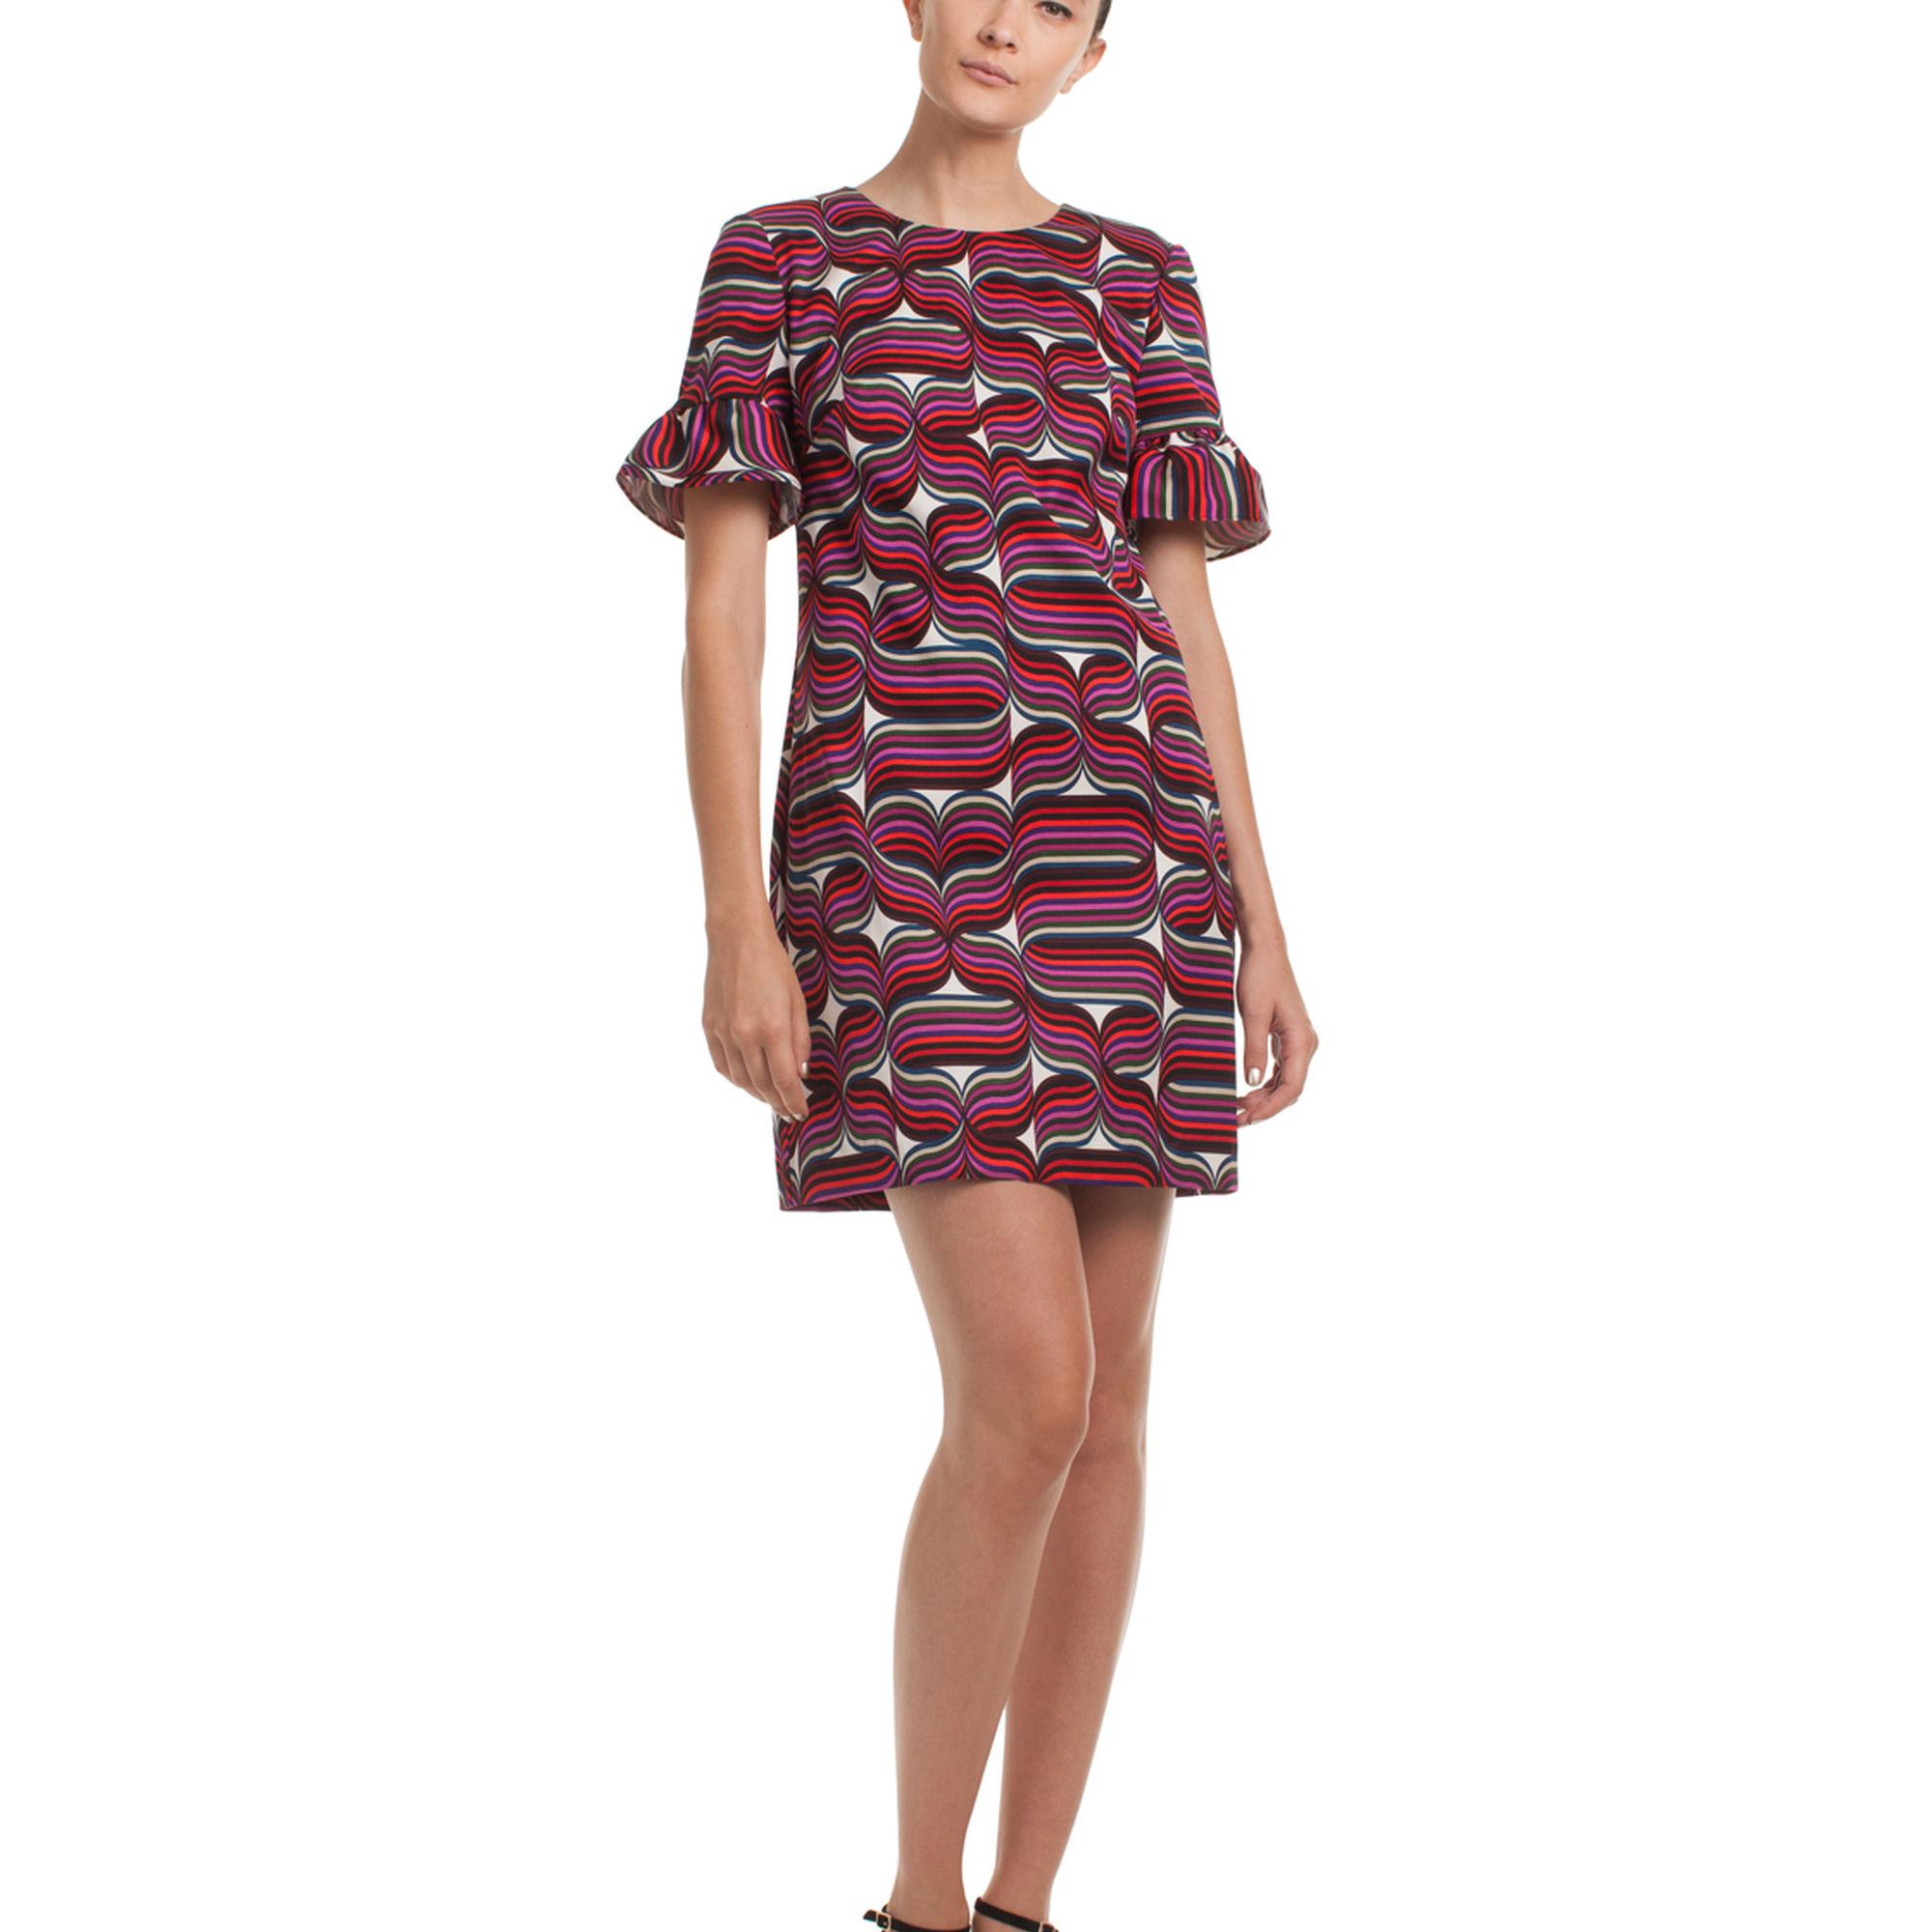 Darling Dress $298